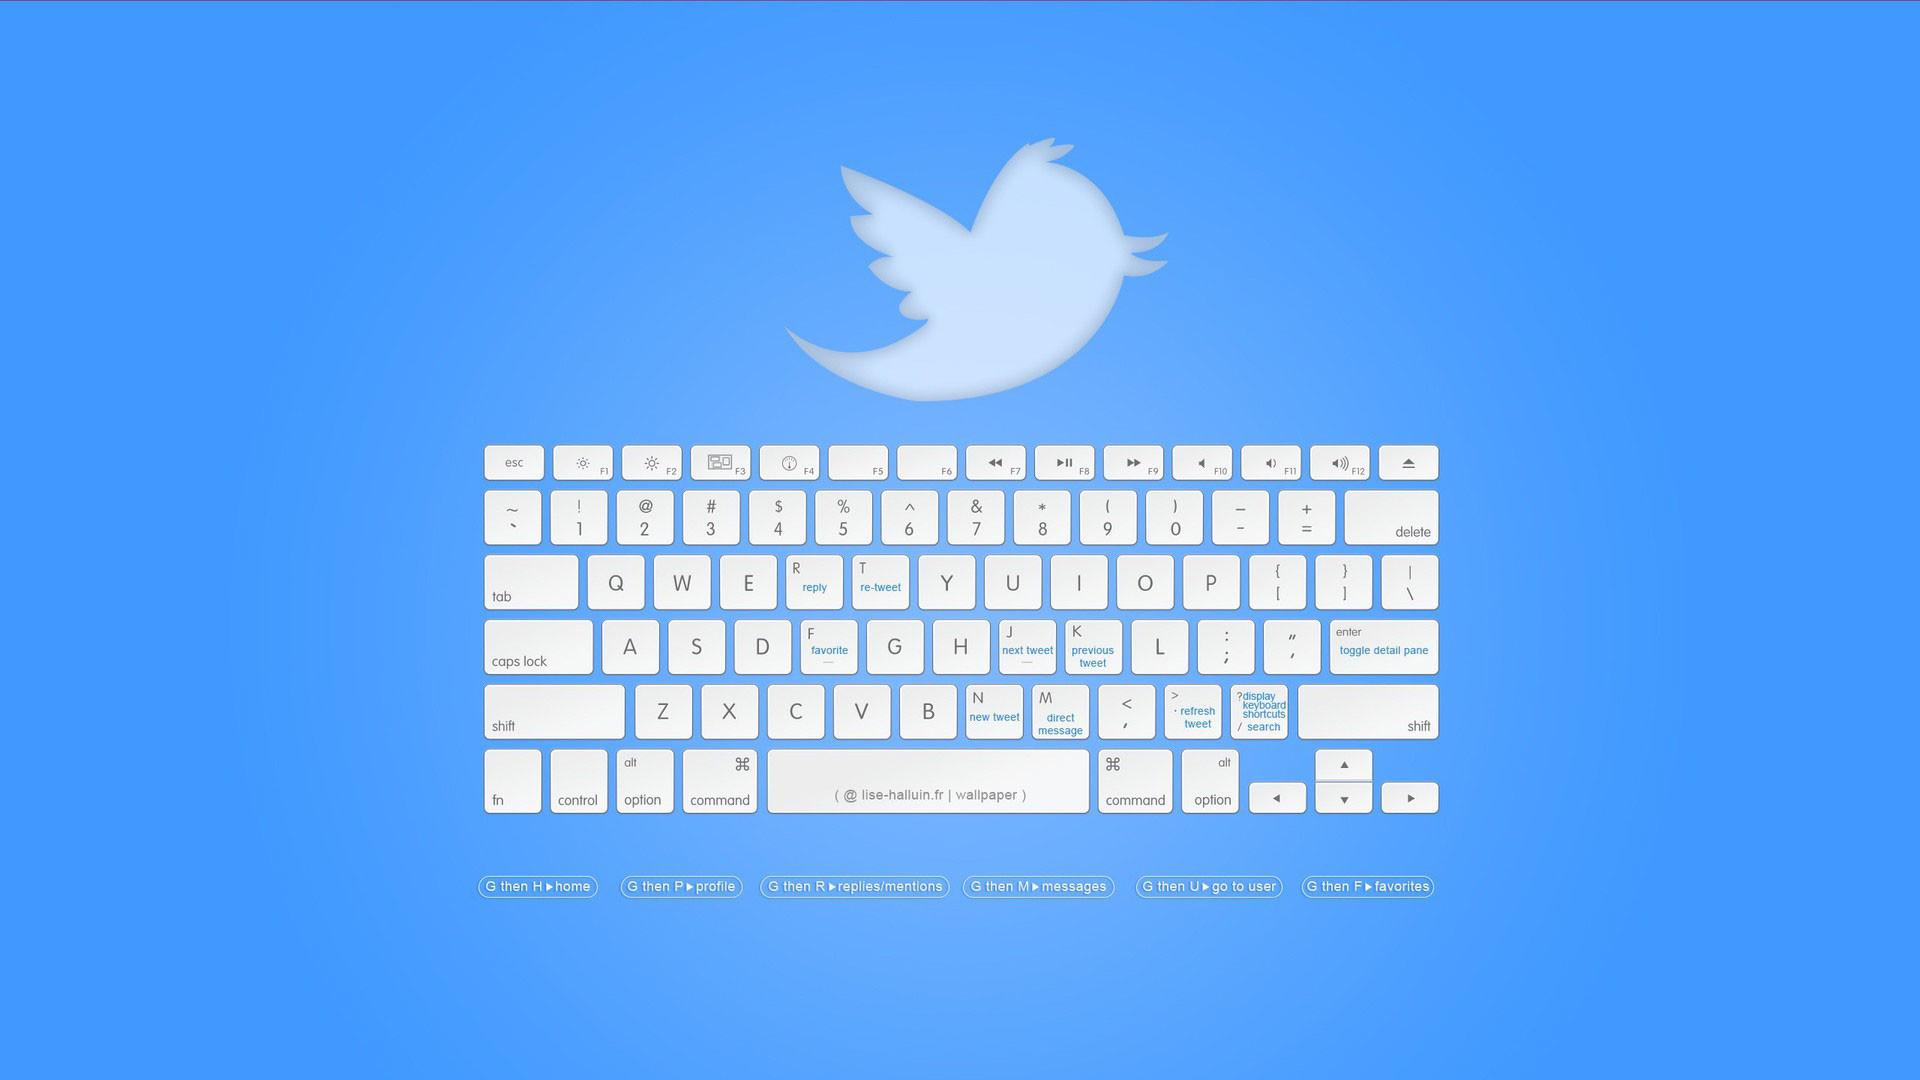 hd pics photos stunning attractive social media 10 hd desktop background  wallpaper